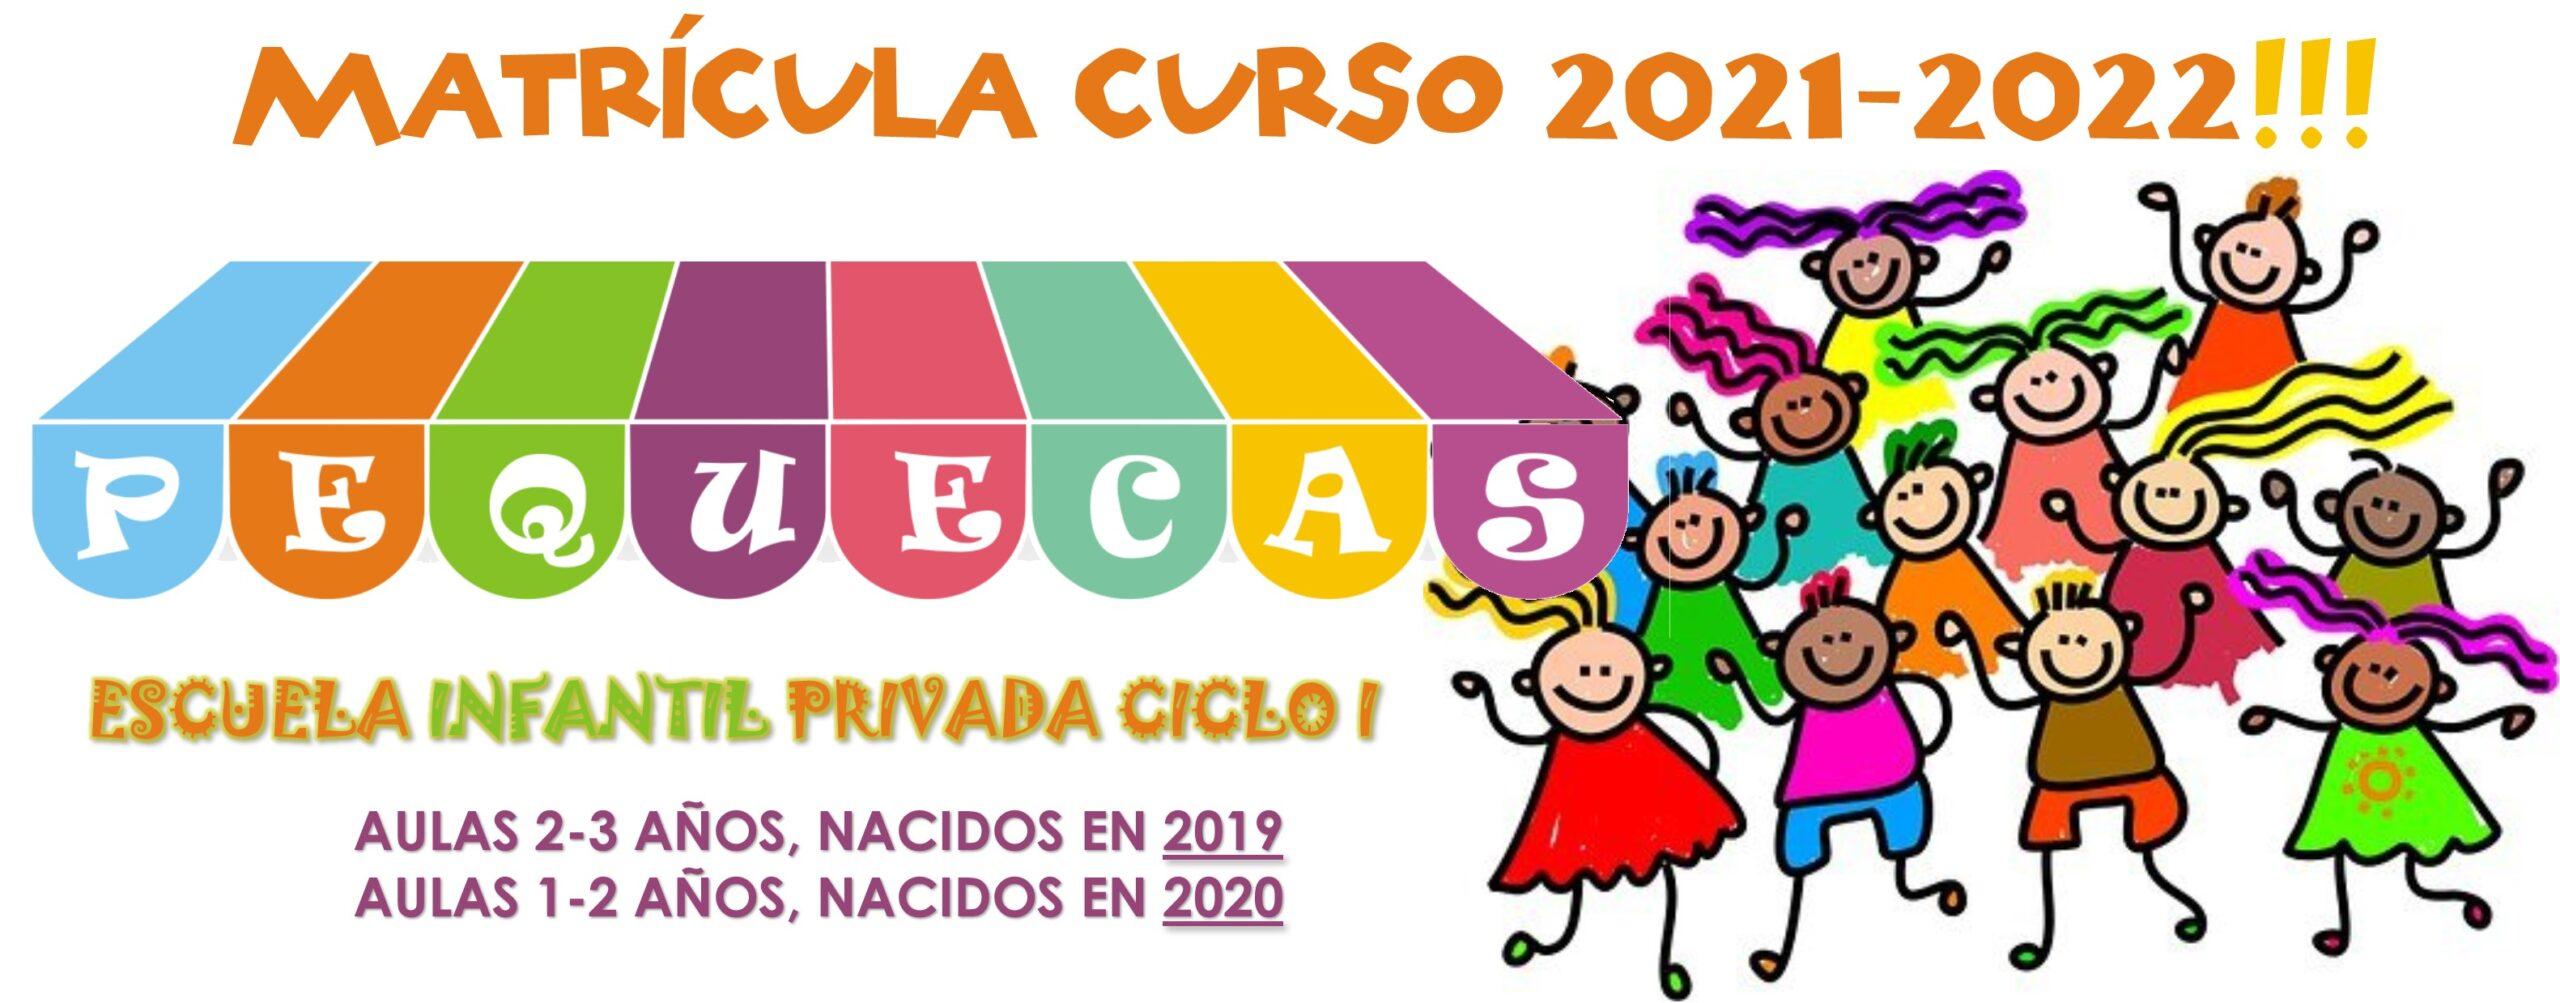 Se abre el plazo para PEQUECAS 2021-2022